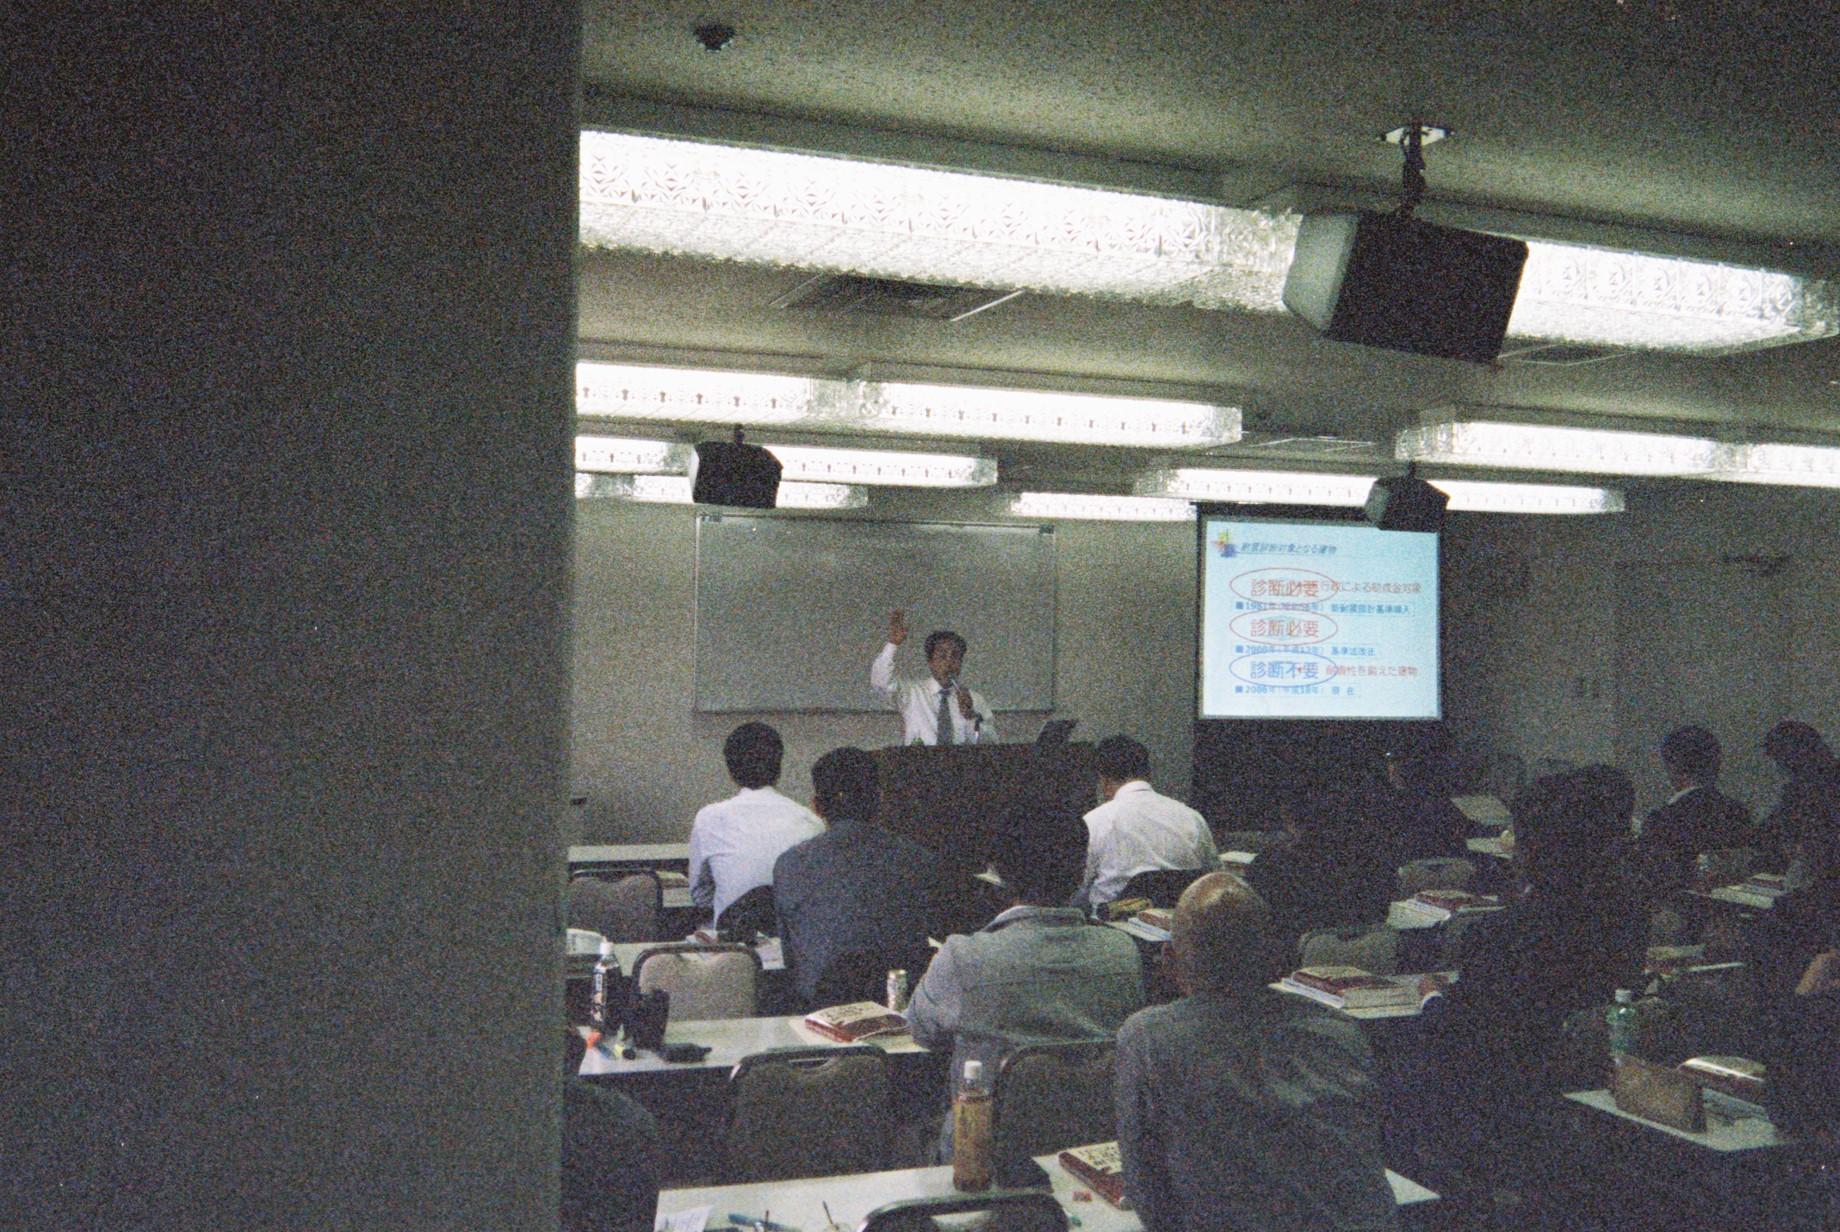 FH020013.JPG